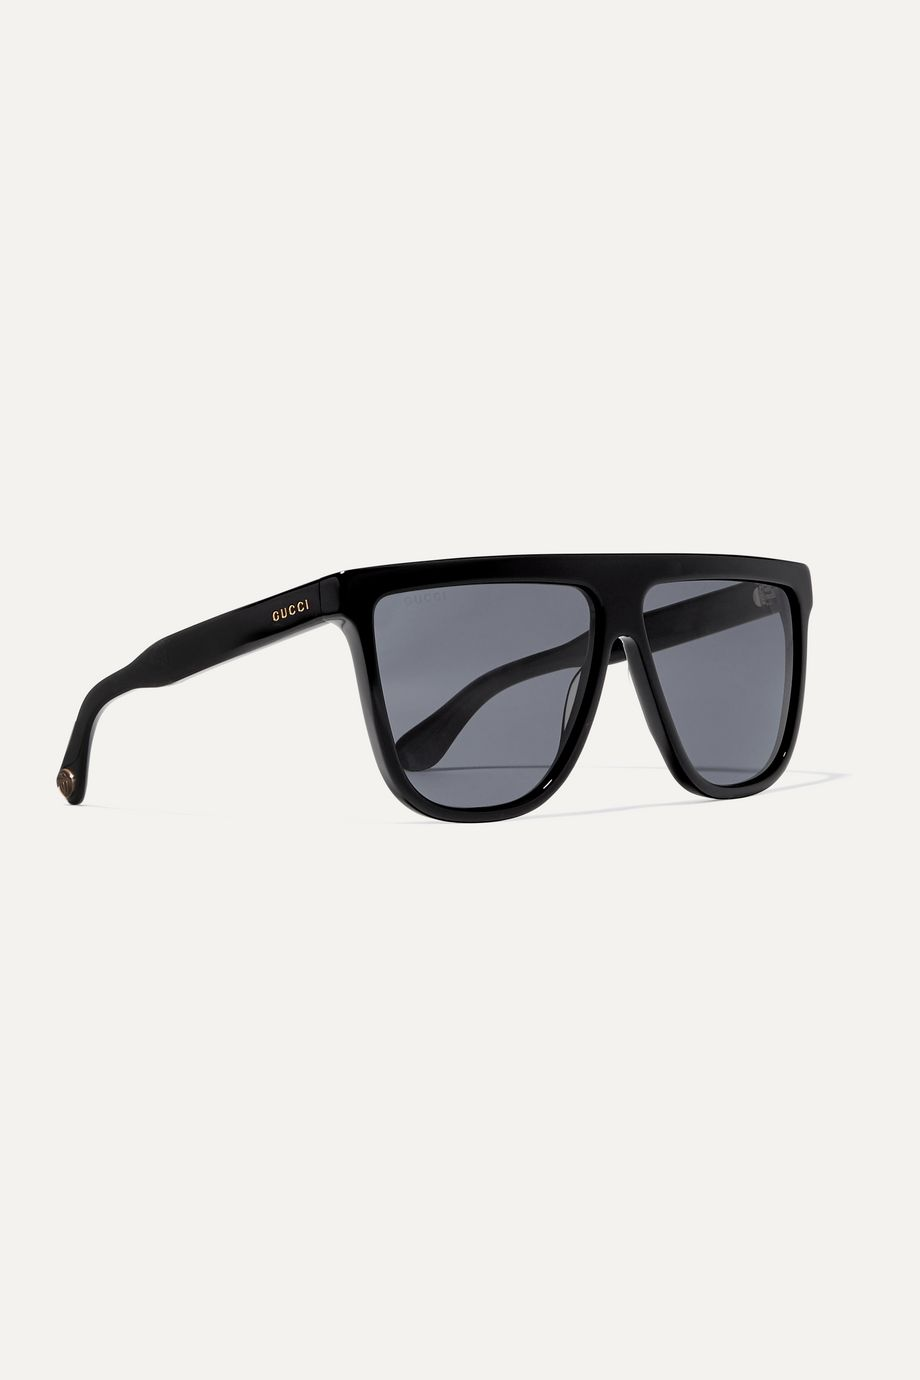 Gucci Guillochet oversized D-frame acetate sunglasses